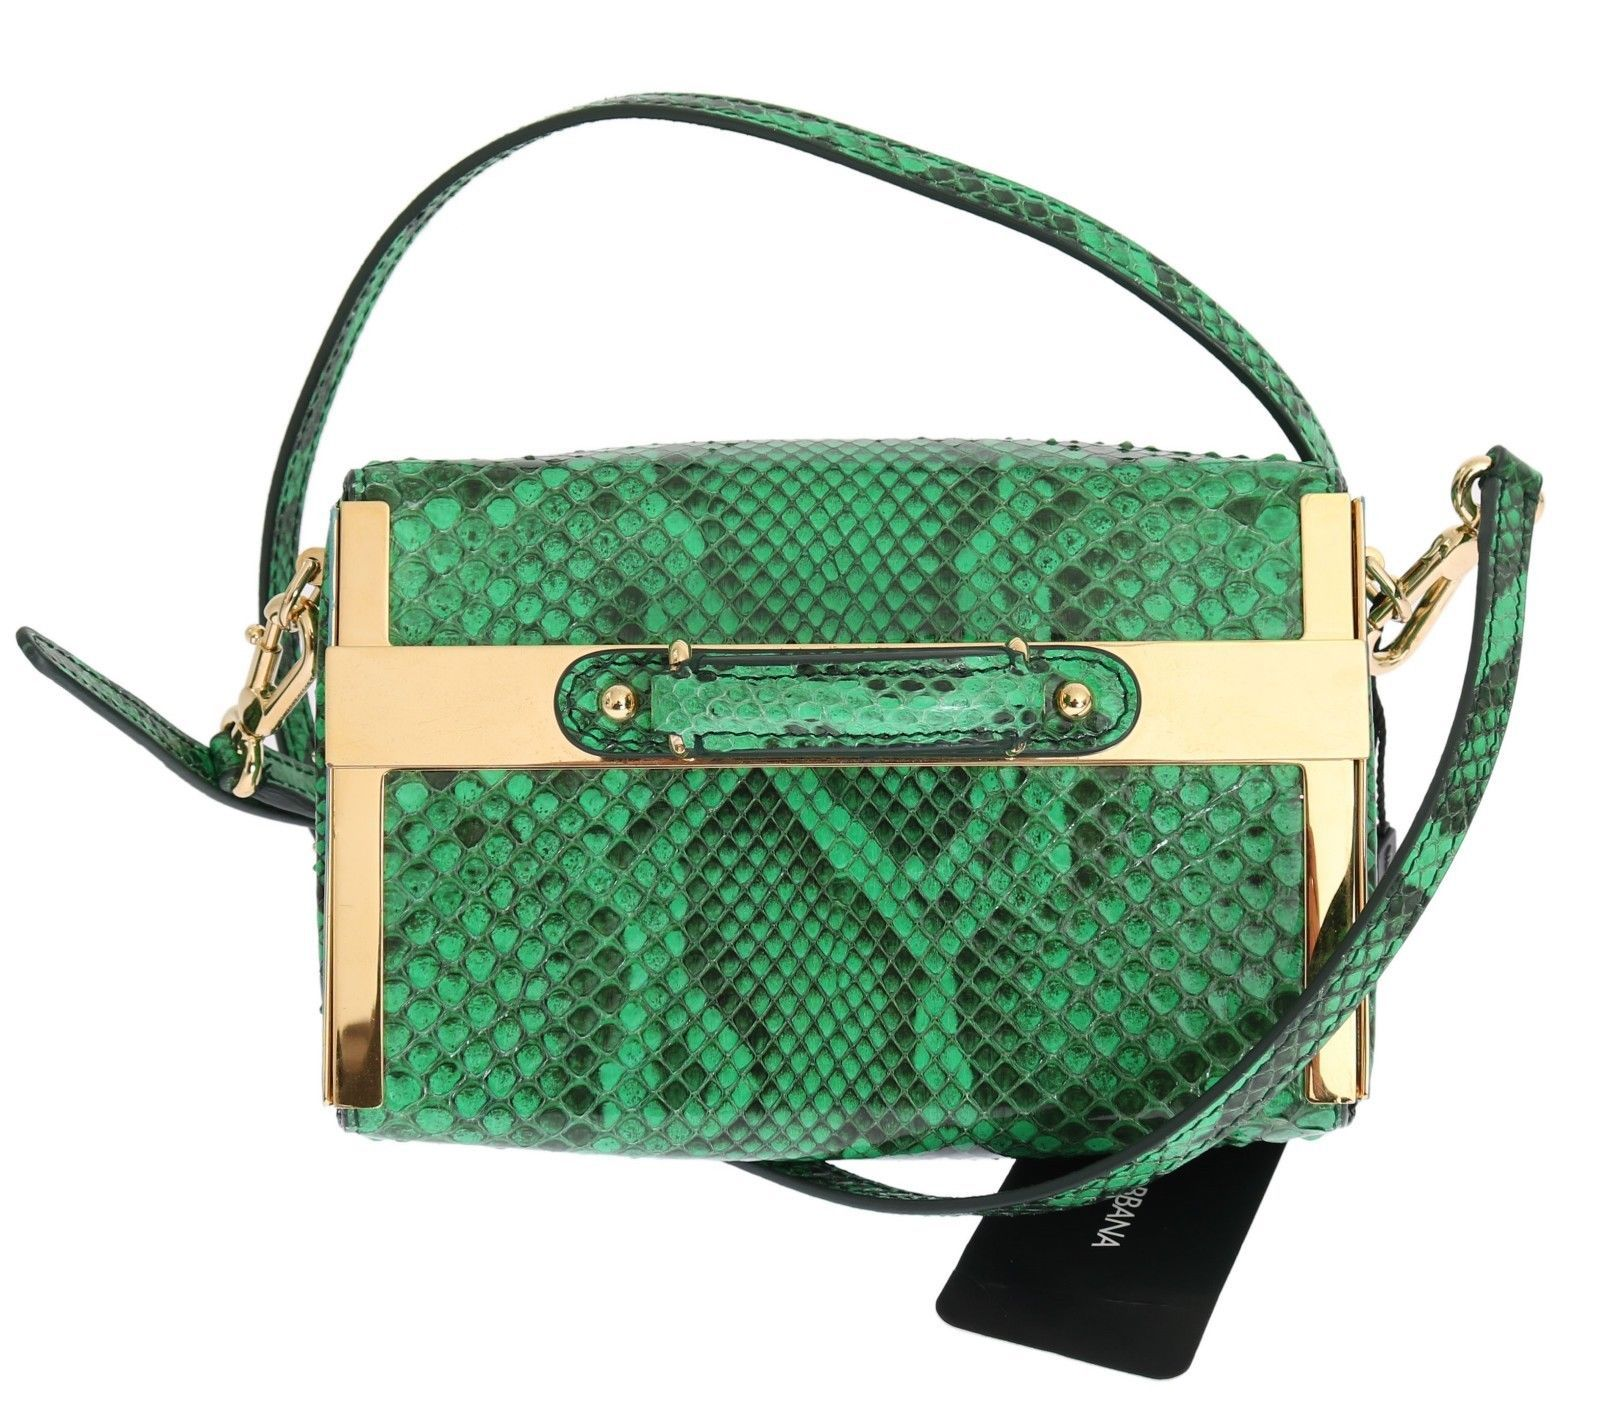 DolceGabbana  HandbagsShoulderBagsPurses Purse GILDA Green Python  Snakeskin Shoulder Handbag  fcee8888a7a2a